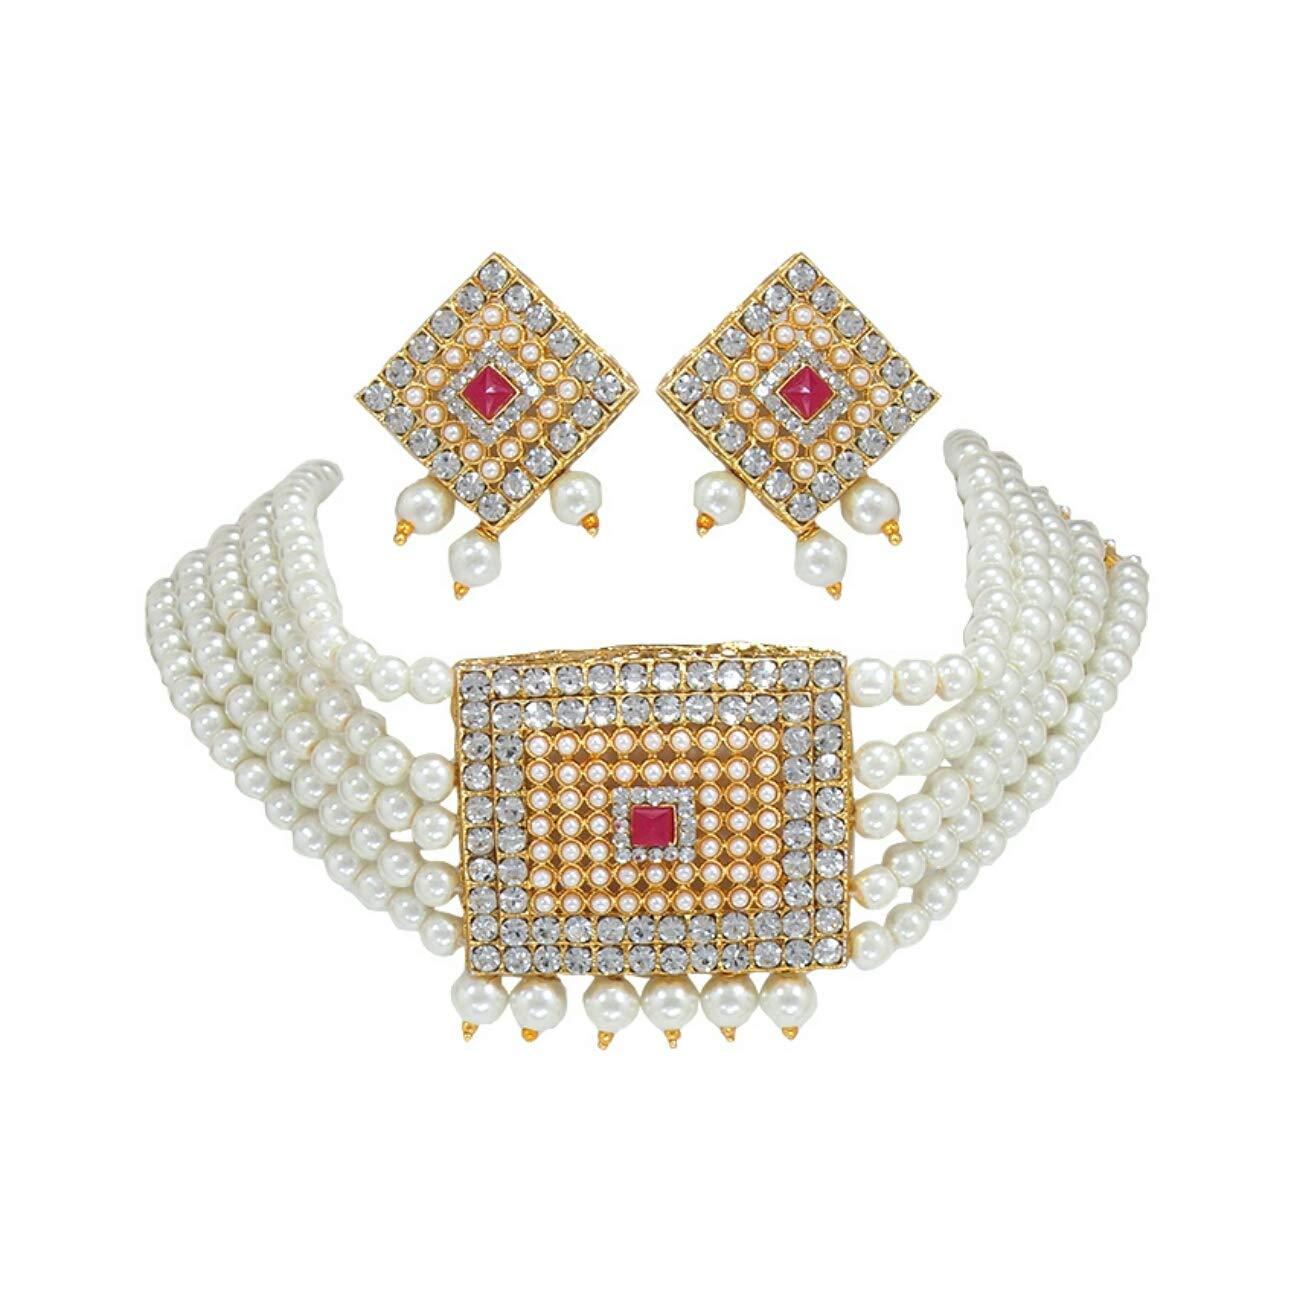 fa94b1ef86f24 Padmawati Traditional Modern Style Square Pattern Pearl Choker Necklace  Earring Jewelry Set for Women & Girls